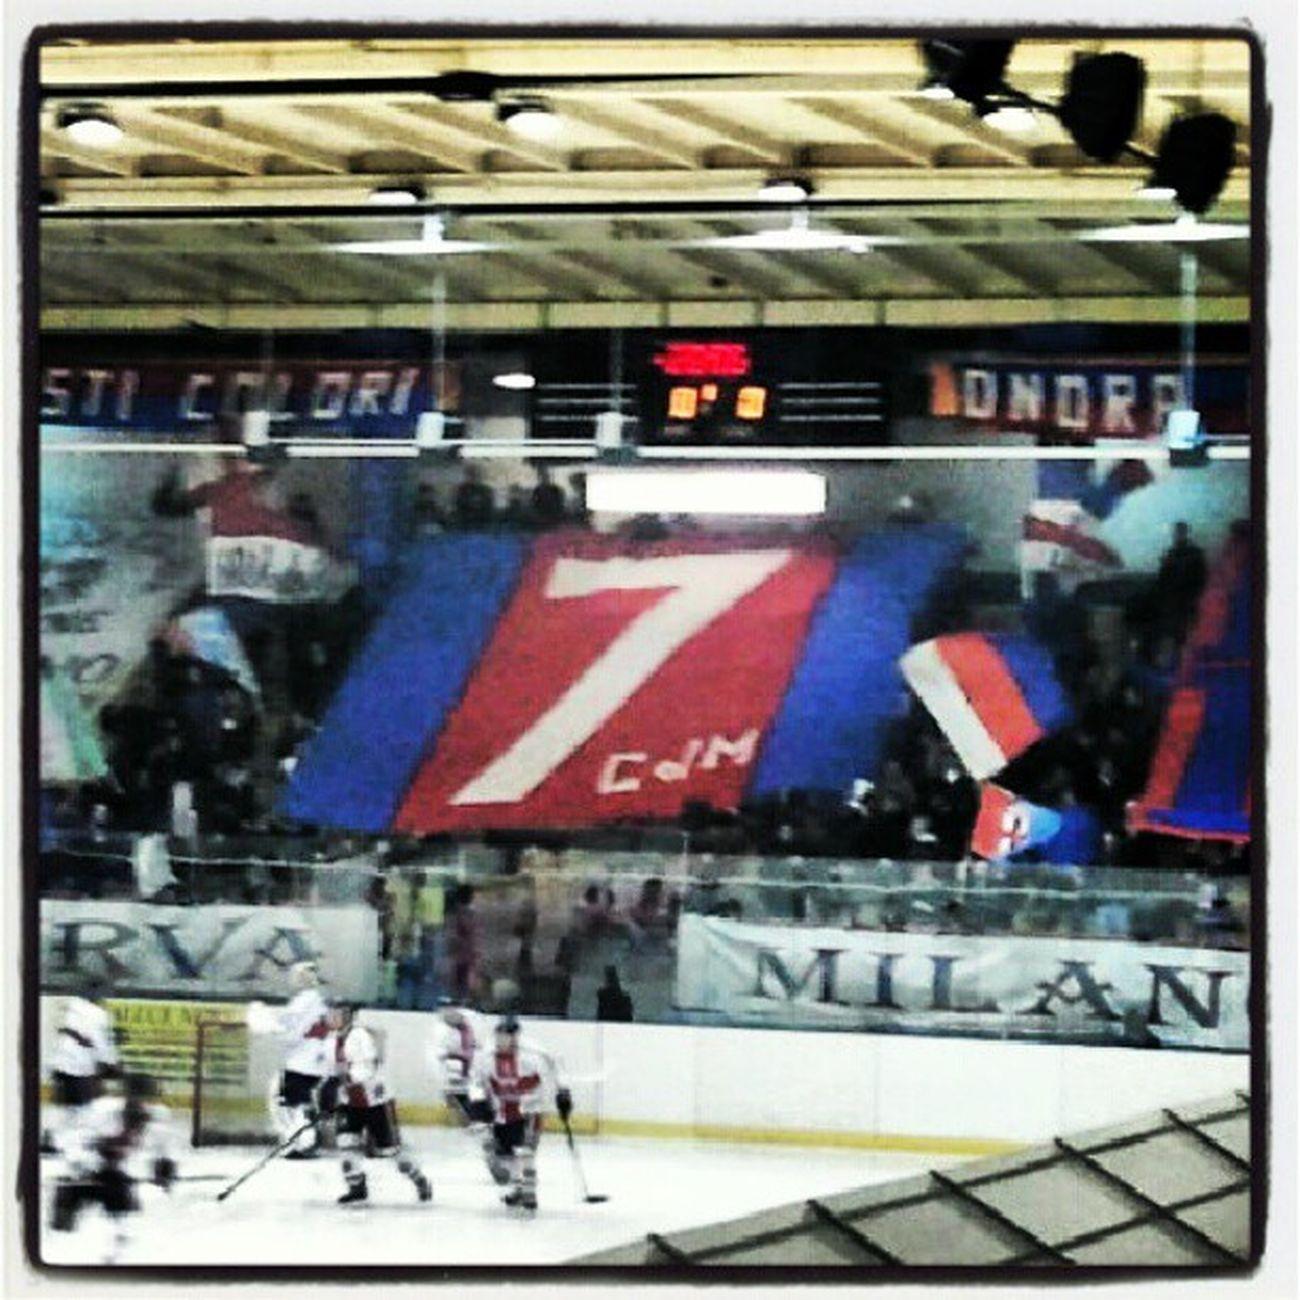 Hockey CDM Saíma Hockeymilano Milanorossoblu Milano